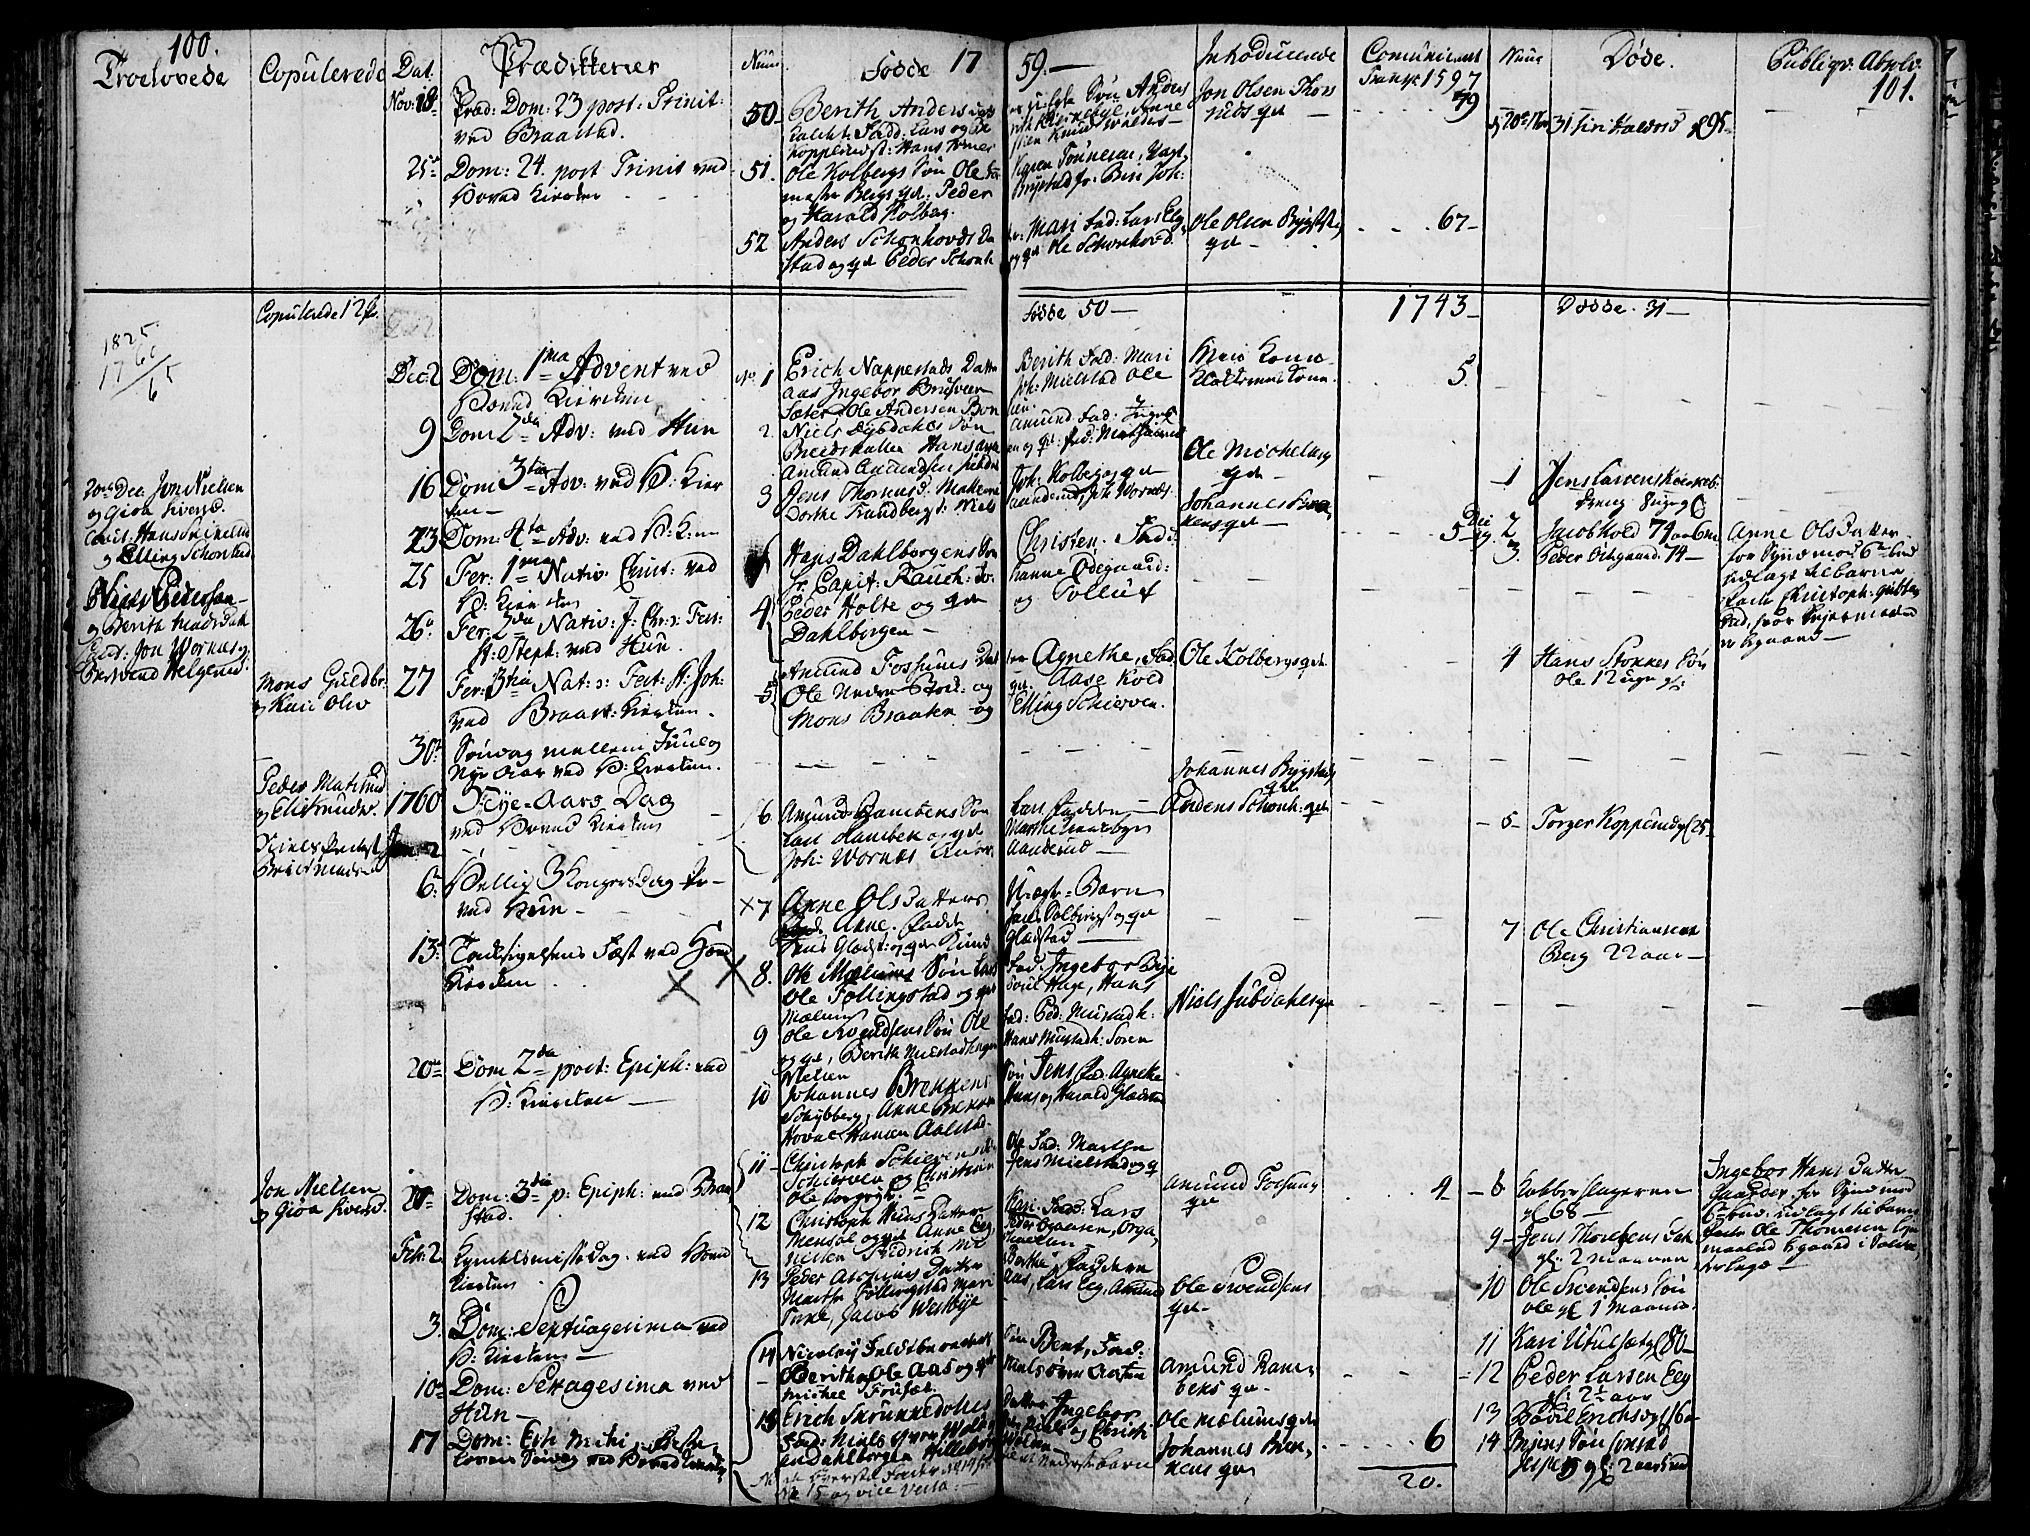 SAH, Vardal prestekontor, H/Ha/Haa/L0002: Ministerialbok nr. 2, 1748-1776, s. 100-101